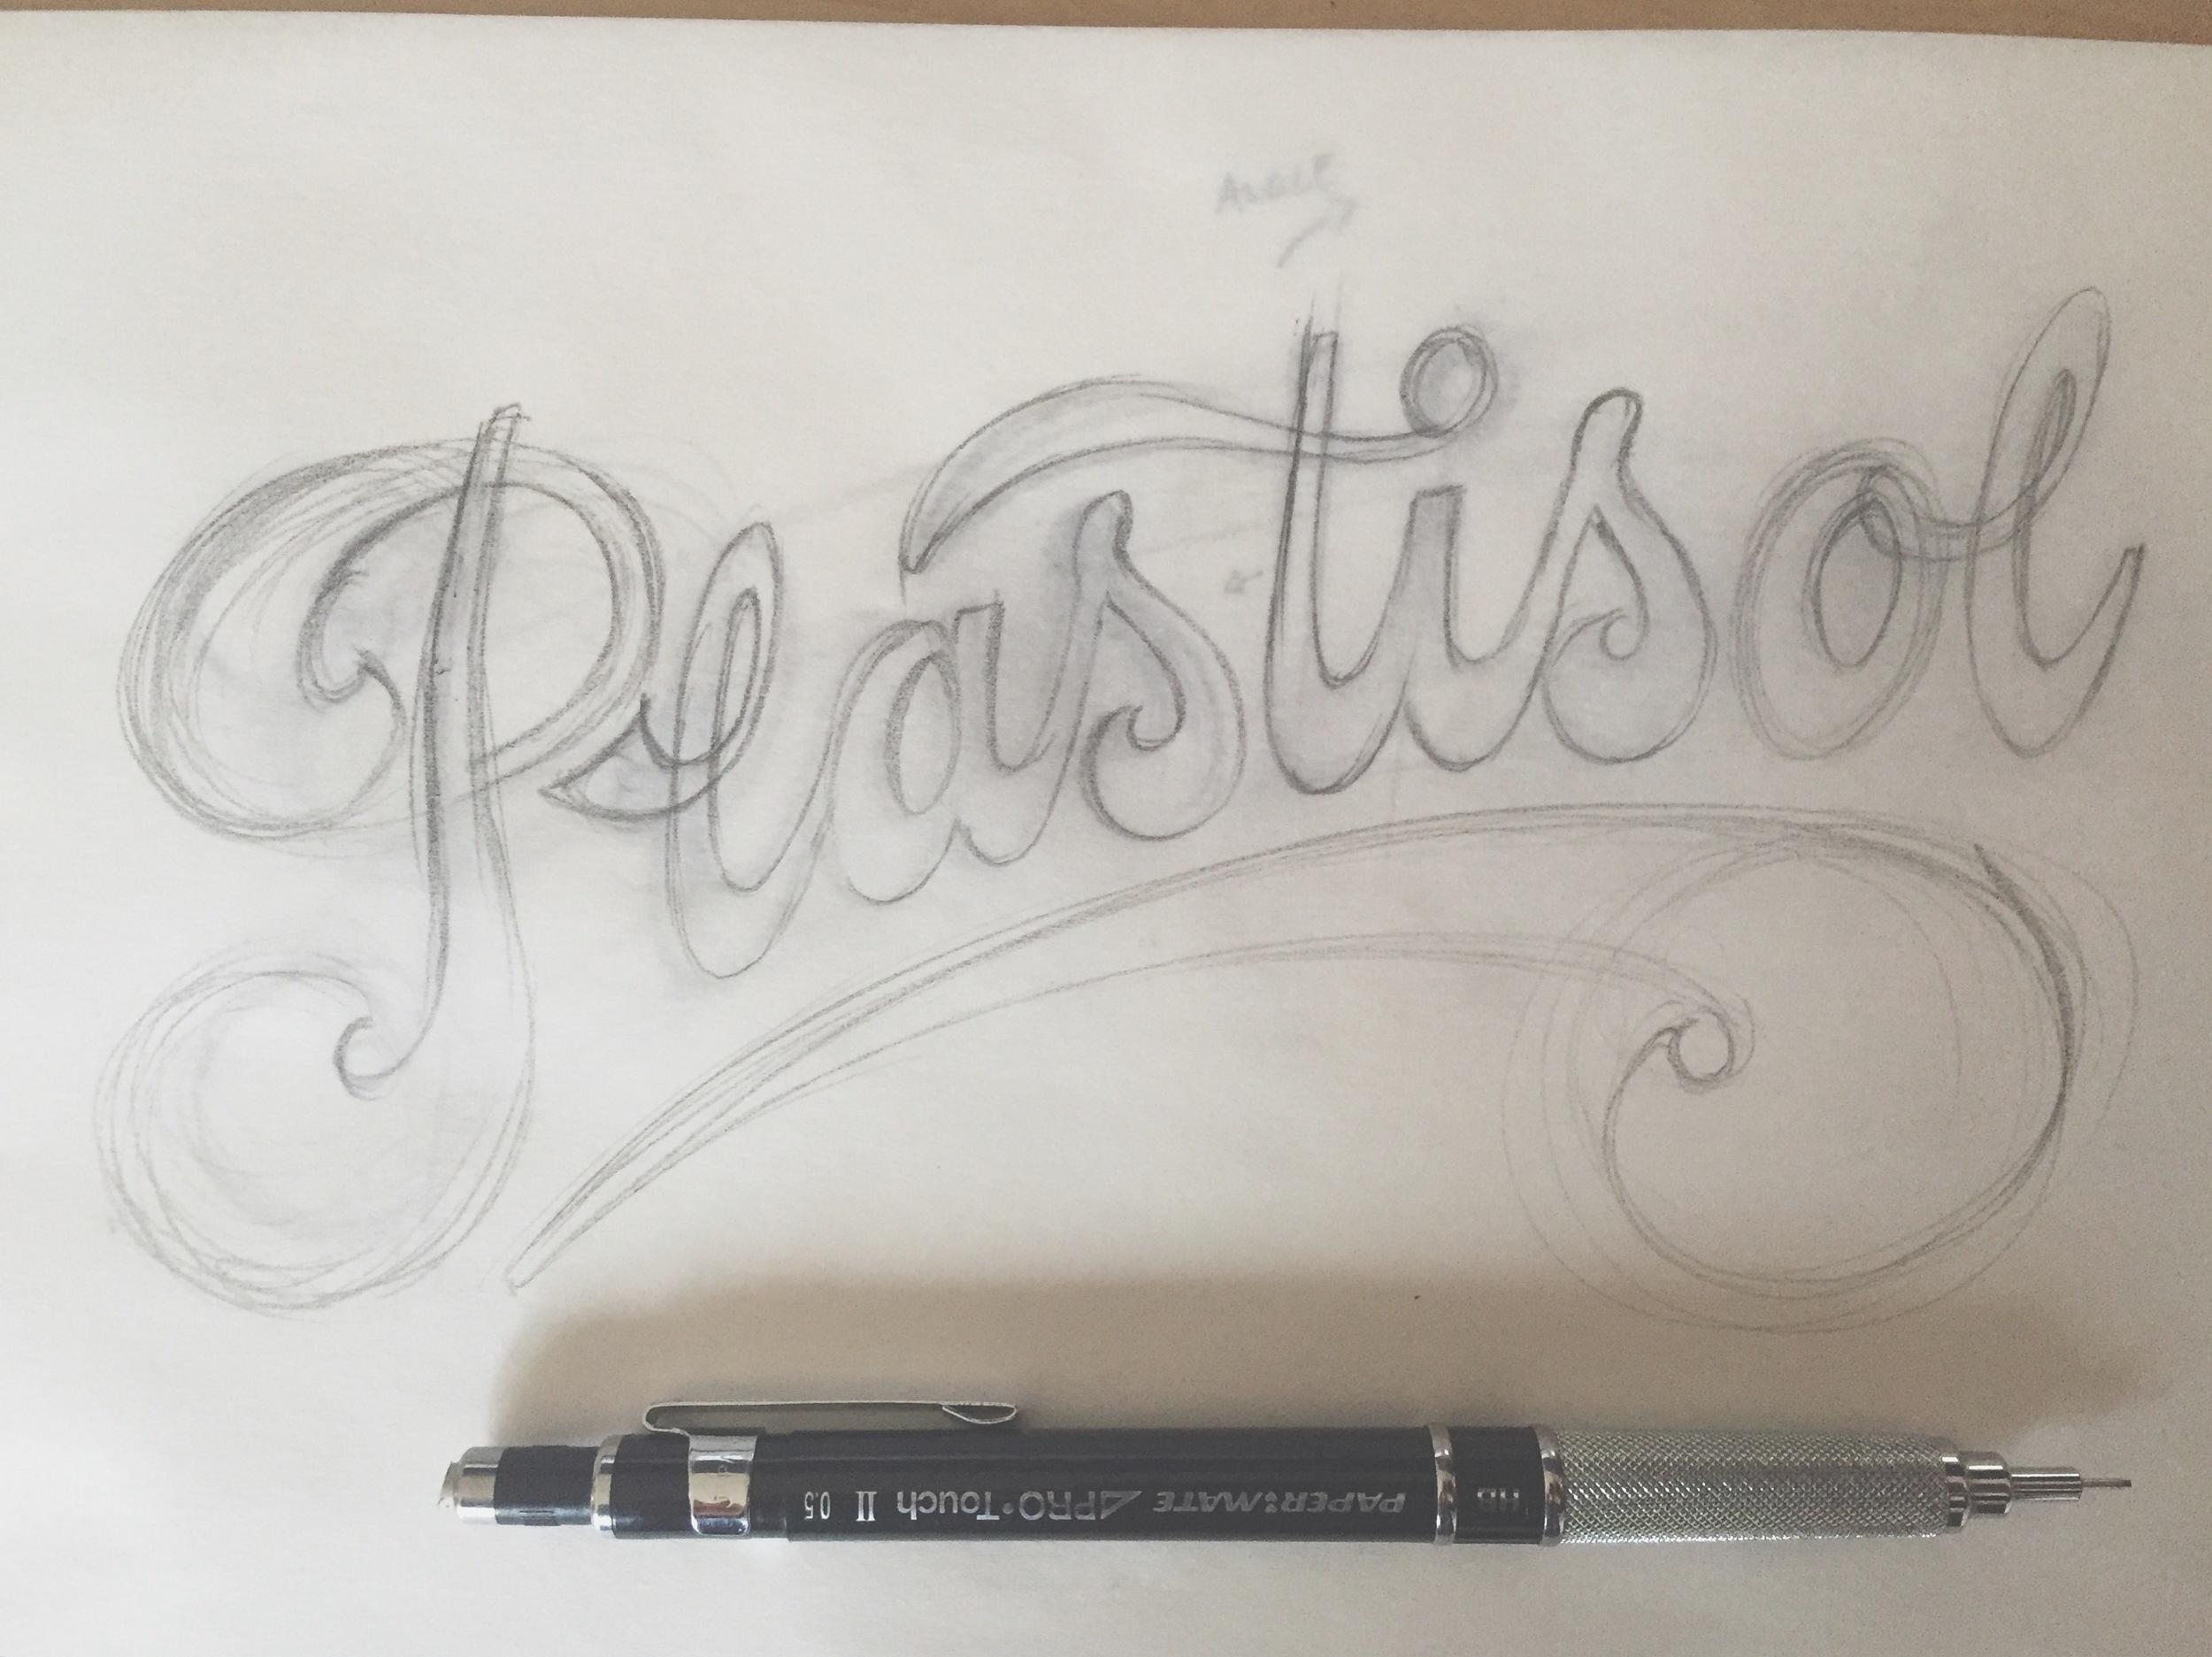 Plastisol lettering sketch